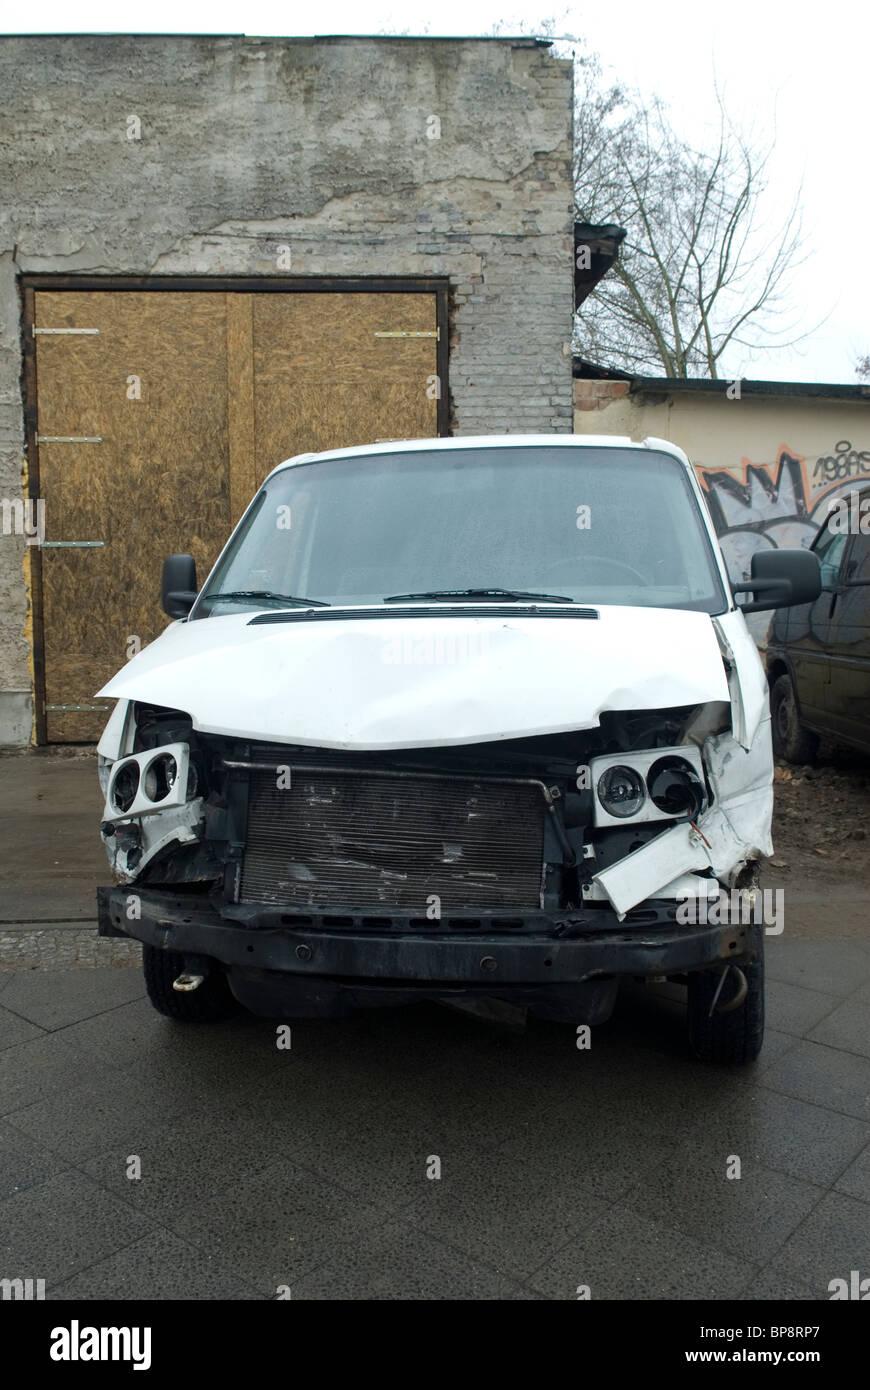 Damaged van parked Berlin Germany - Stock Image